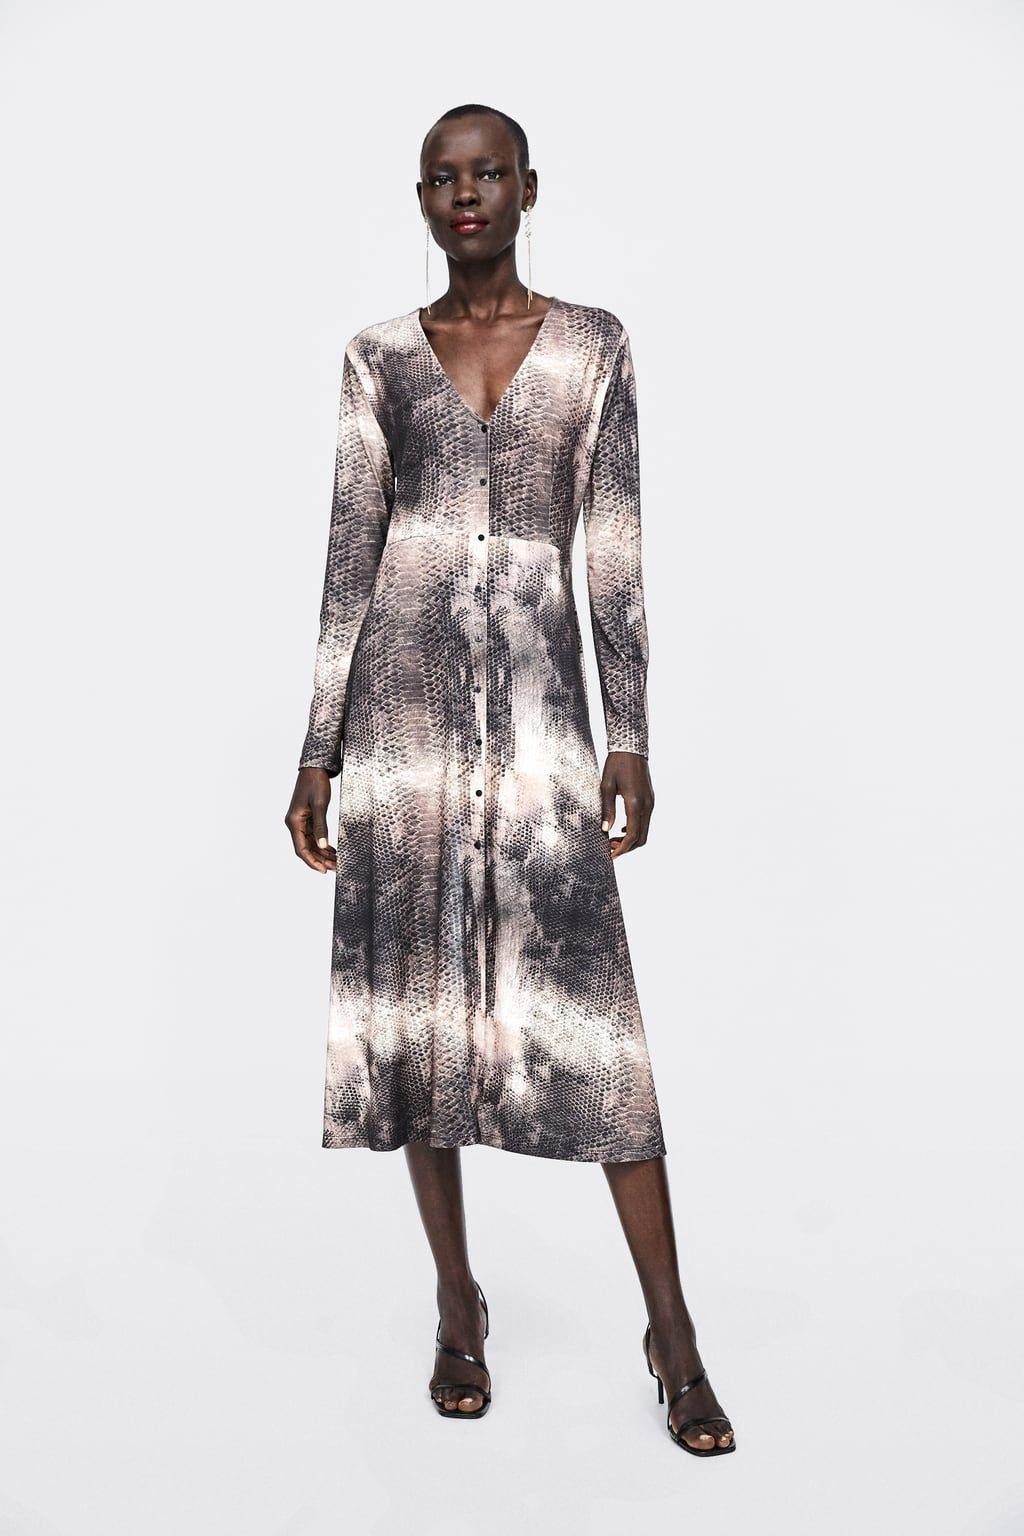 Image 1 Of Animal Print Dress From Zara  Bedruckte